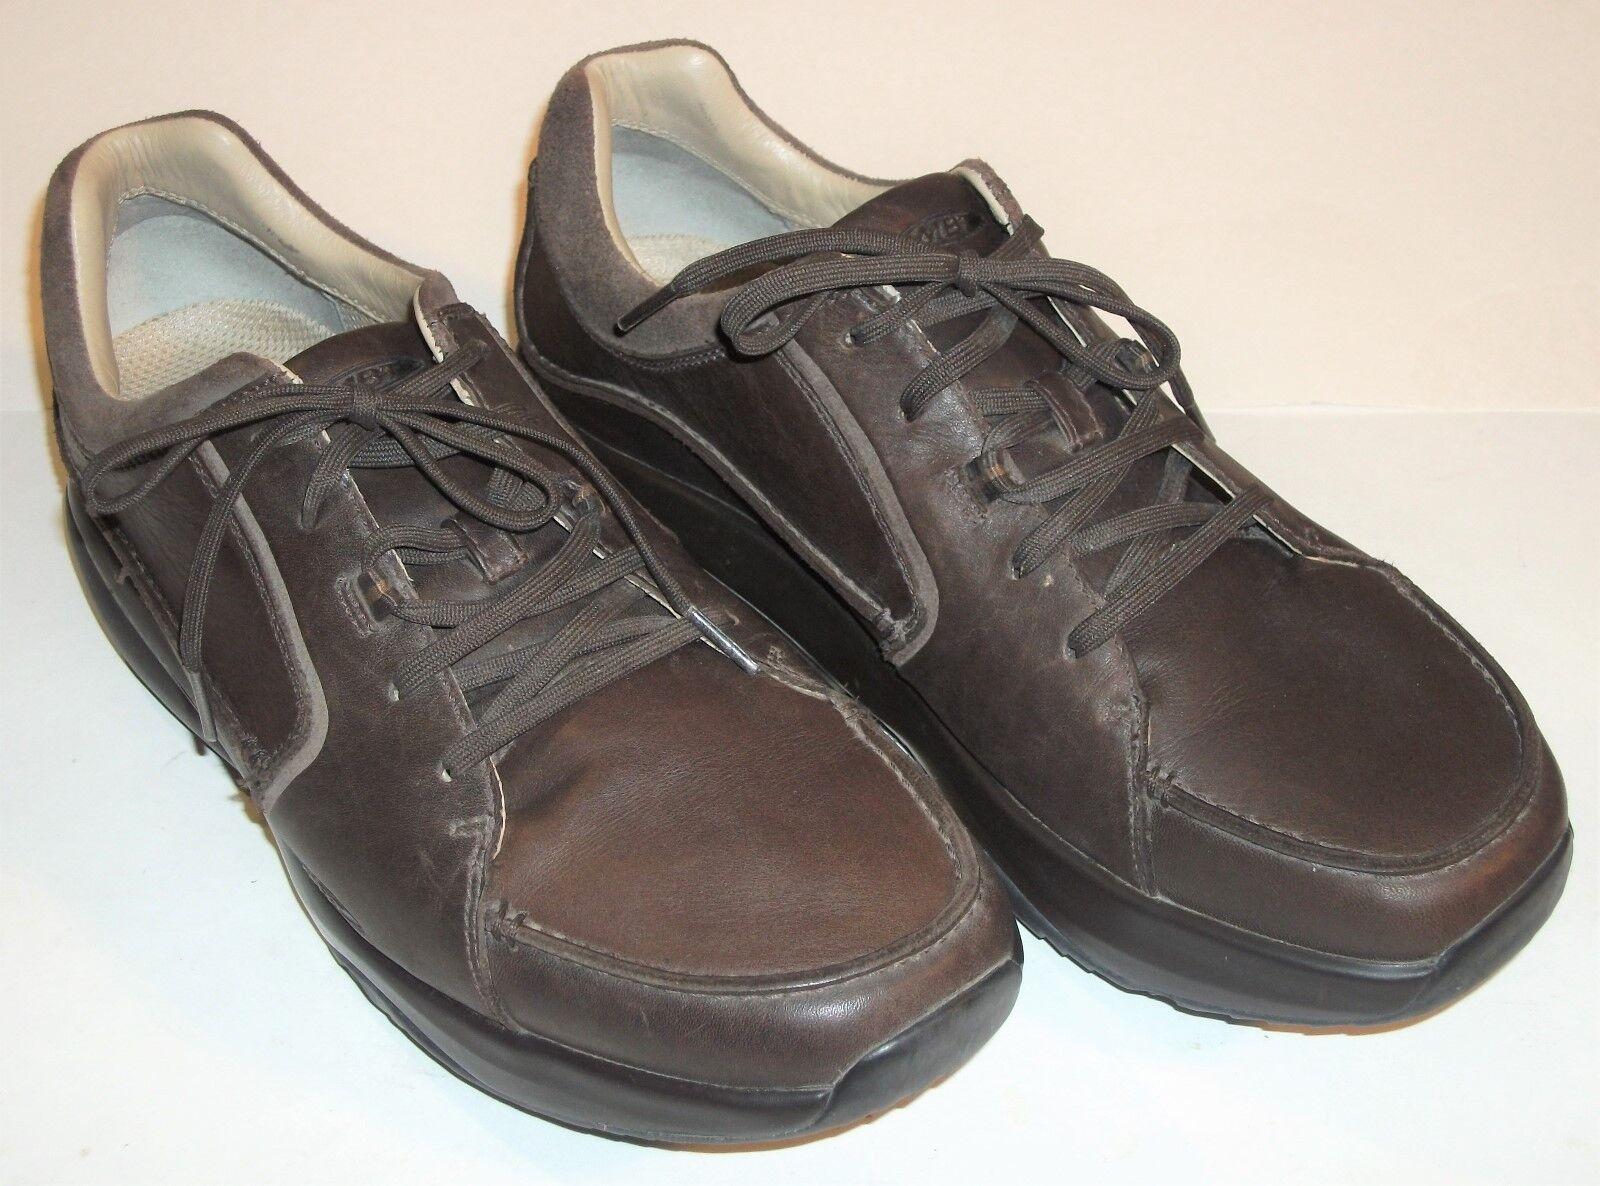 MBT Fanaka Men Brown Leather Oxford Walking Work shoes Rocker 400223-01 Size 12